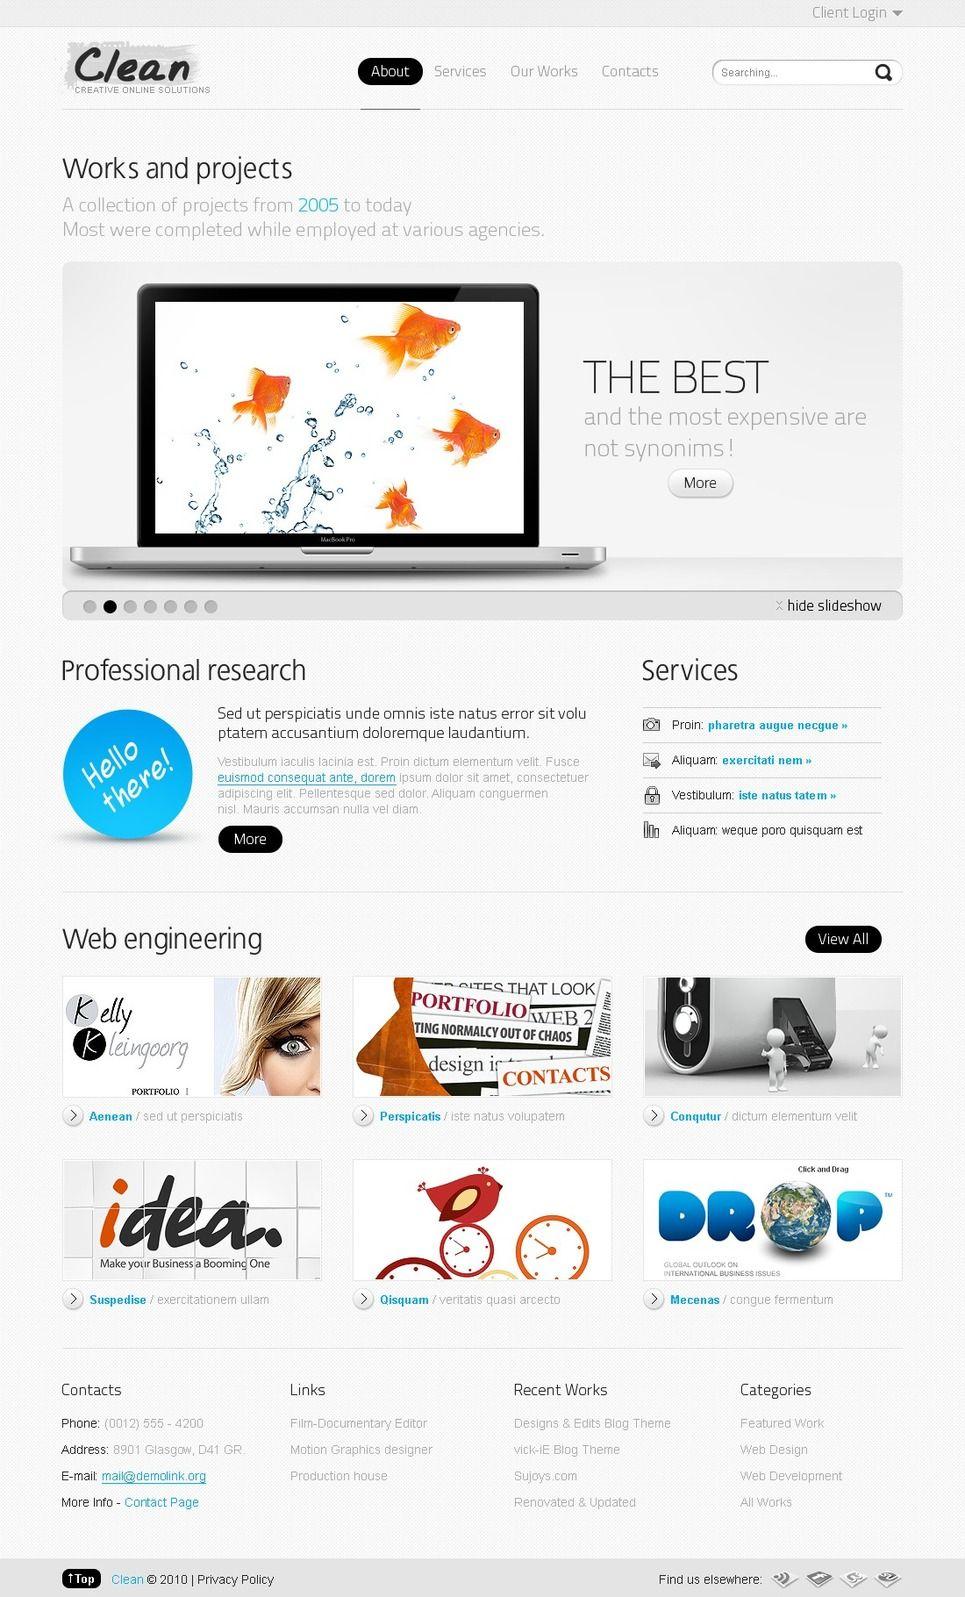 Web Design Psd Template 54269 With Images Psd Templates Web Design Templates